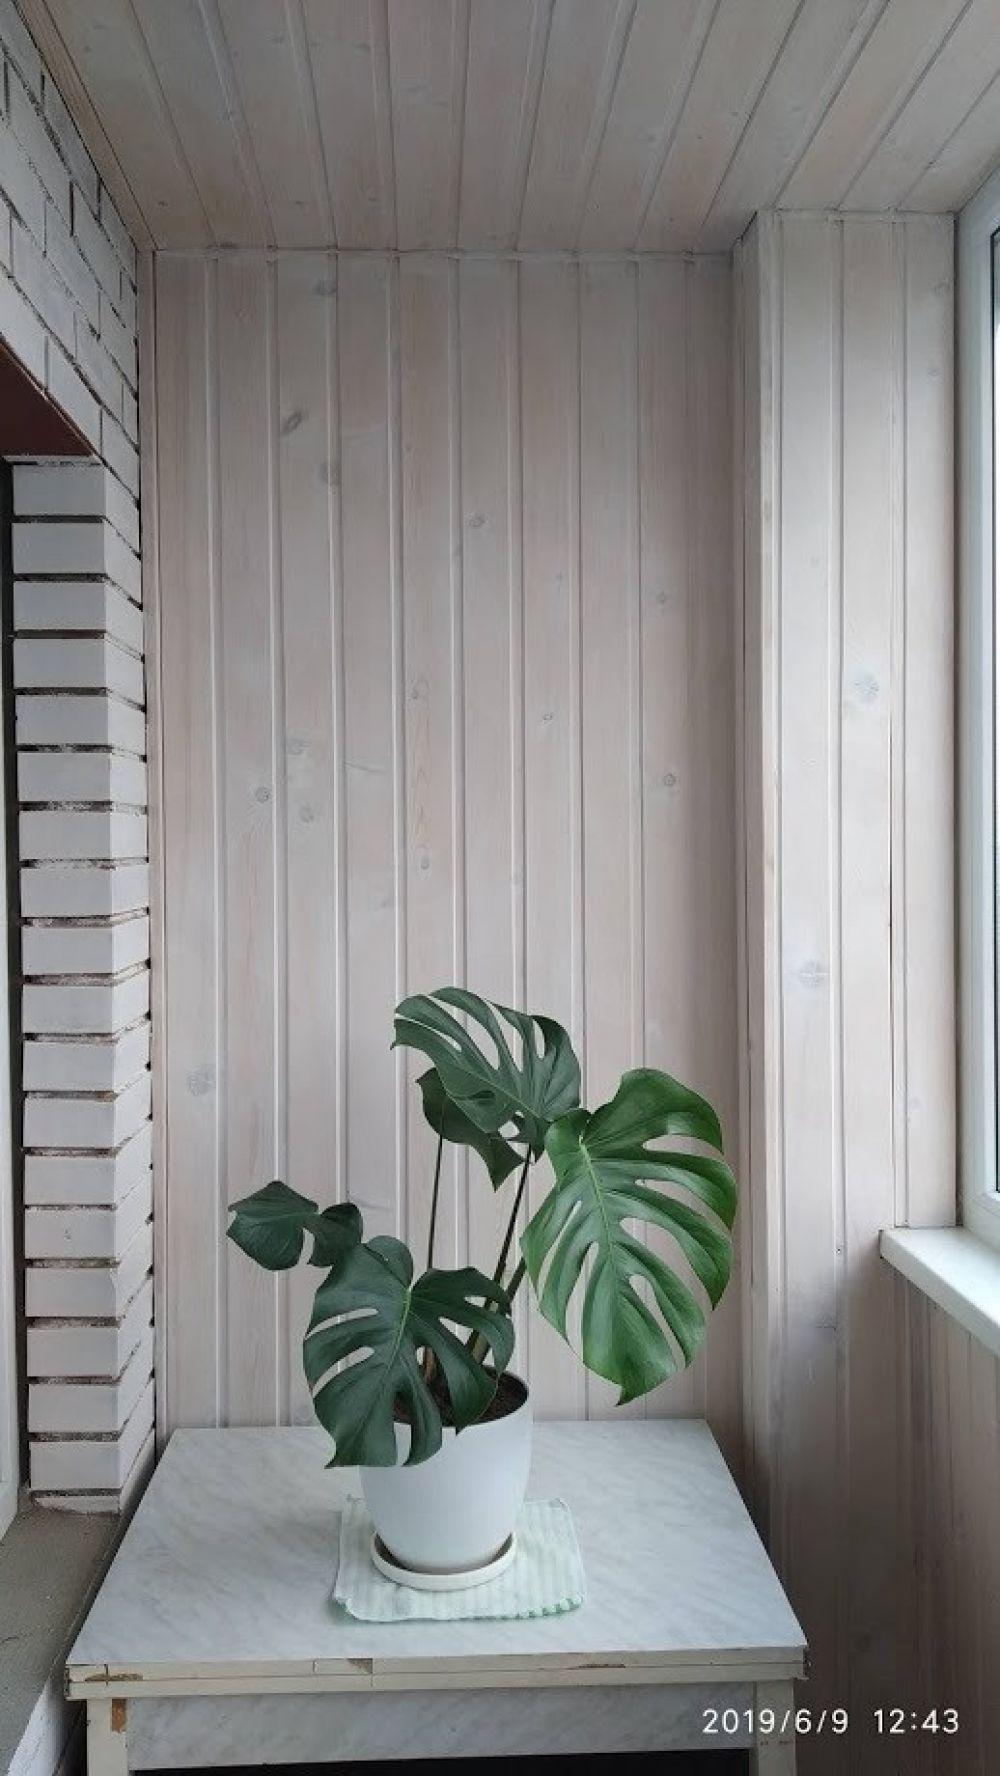 2-к квартира, г. Щелково, мкр. Финский, 9к1, фото 10